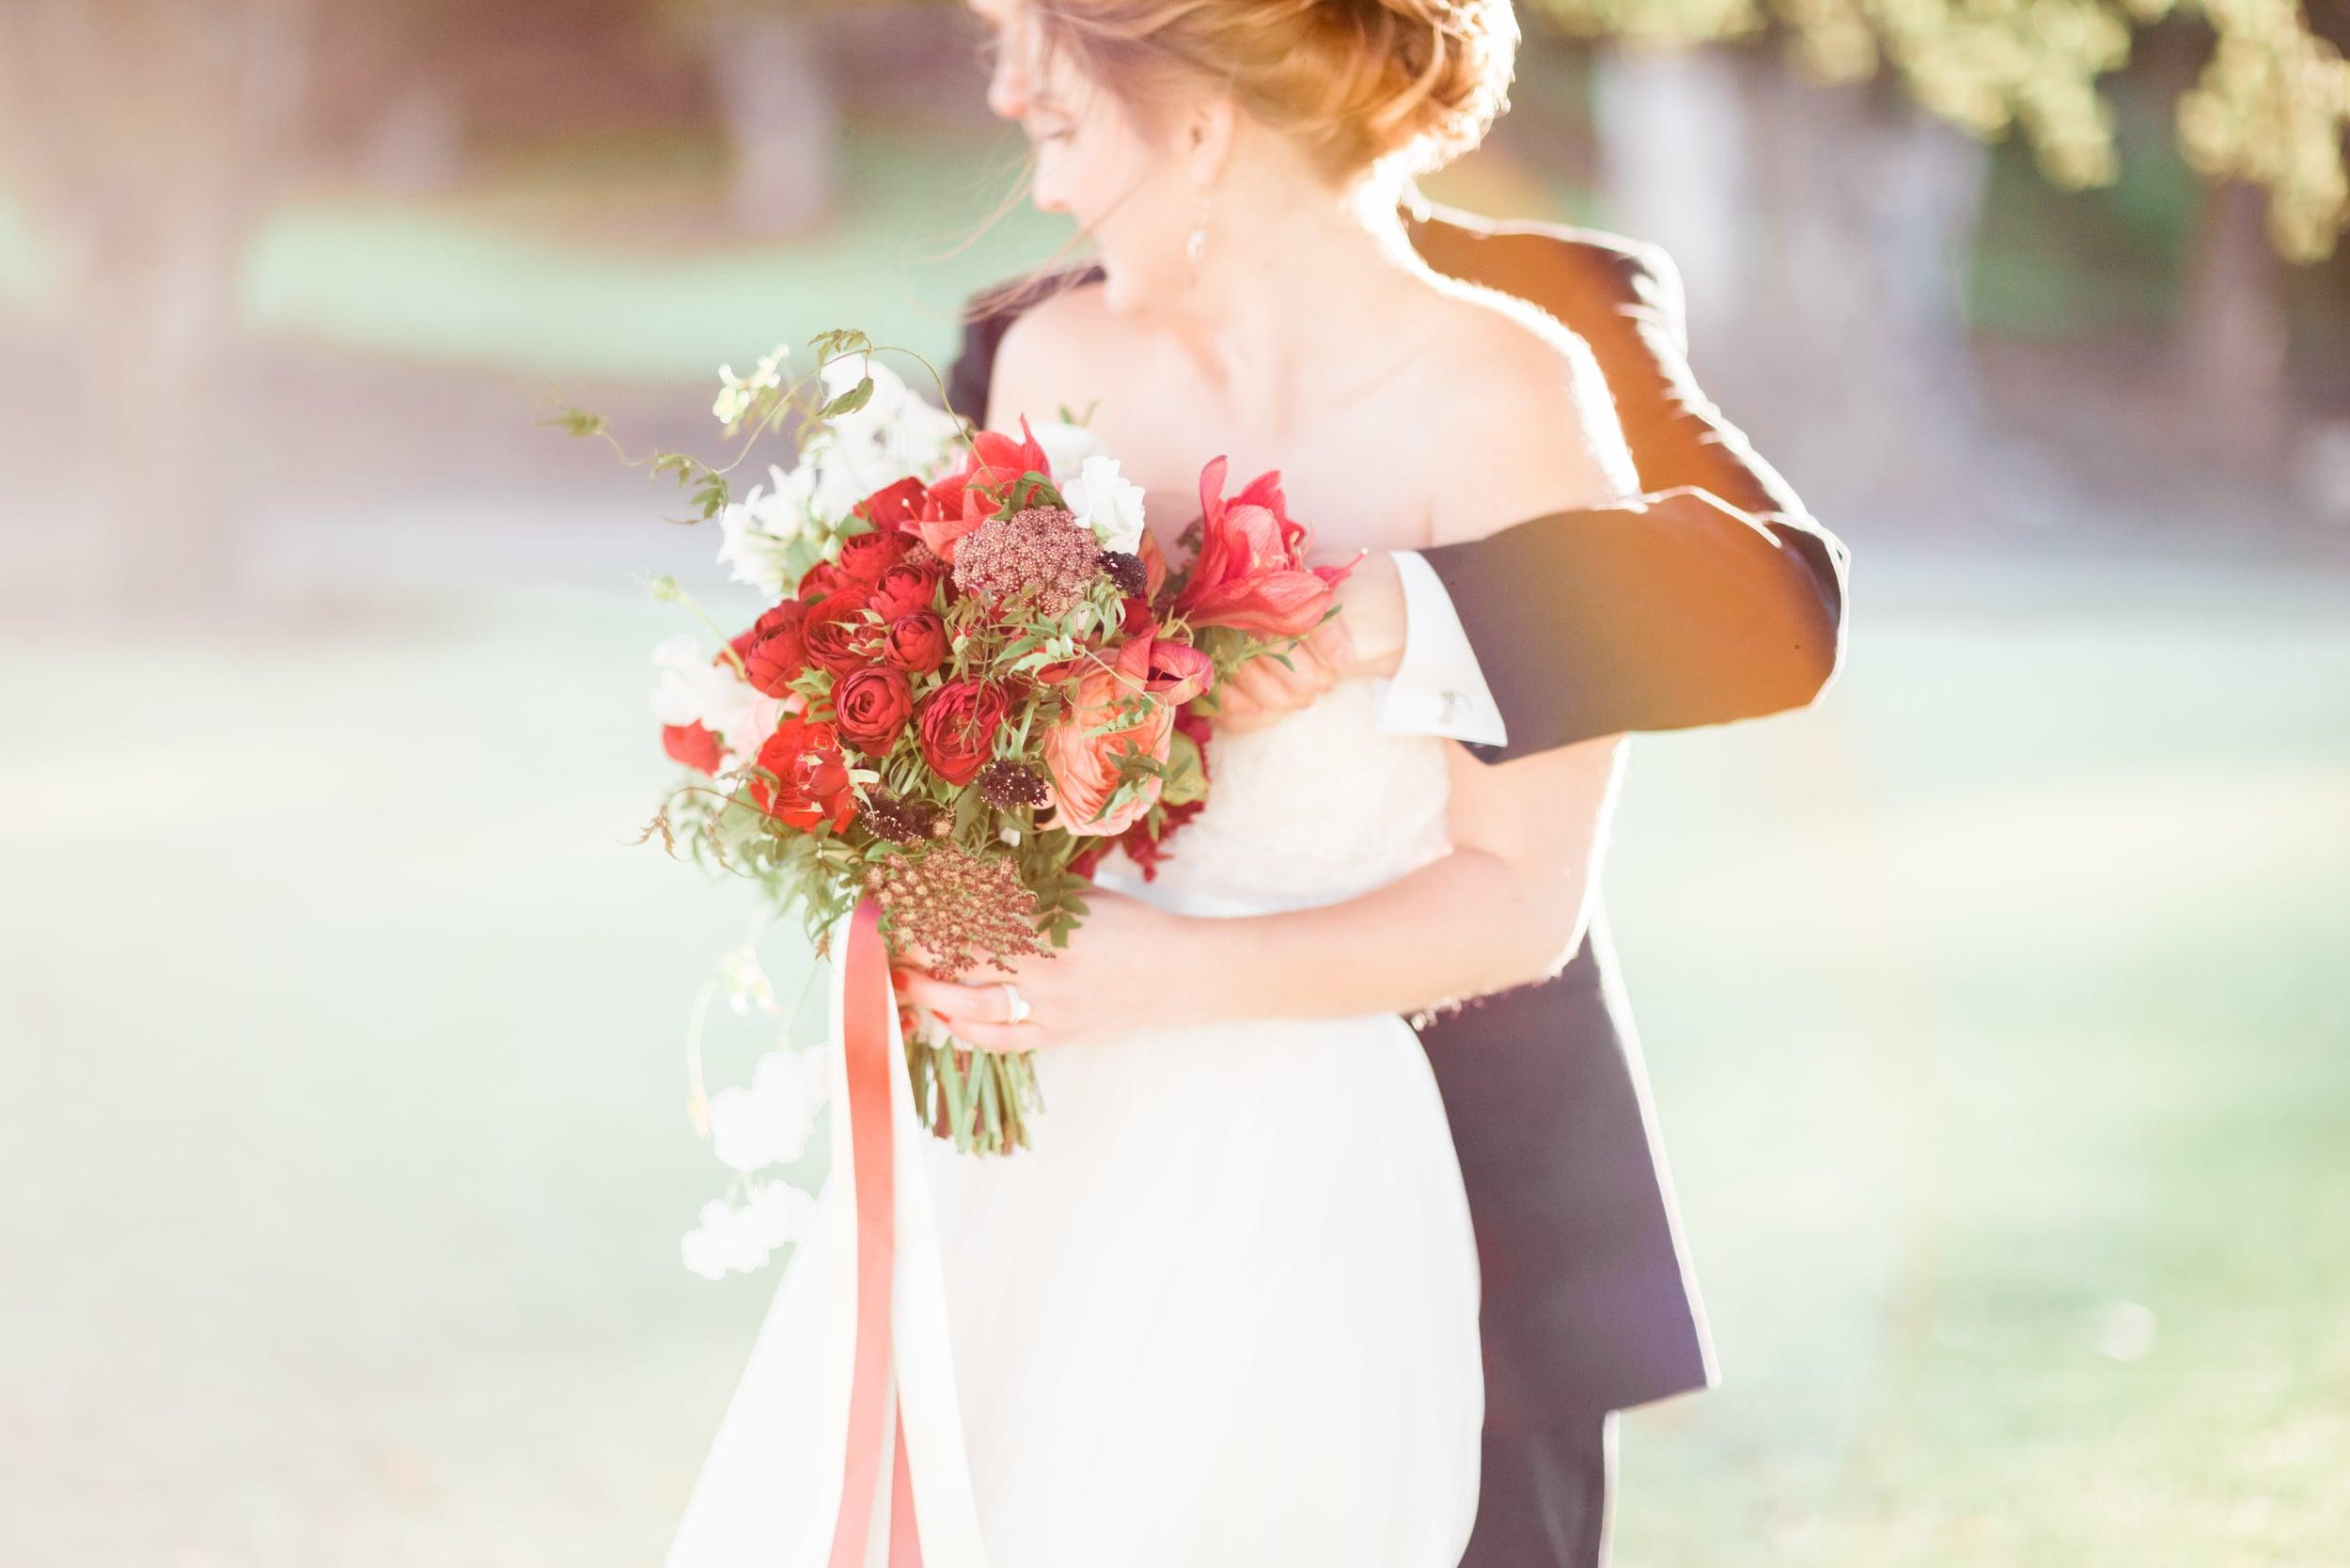 Natalie_Schutt_Photography_Winter_Wedding_San_Luis_Obispo-164.jpg